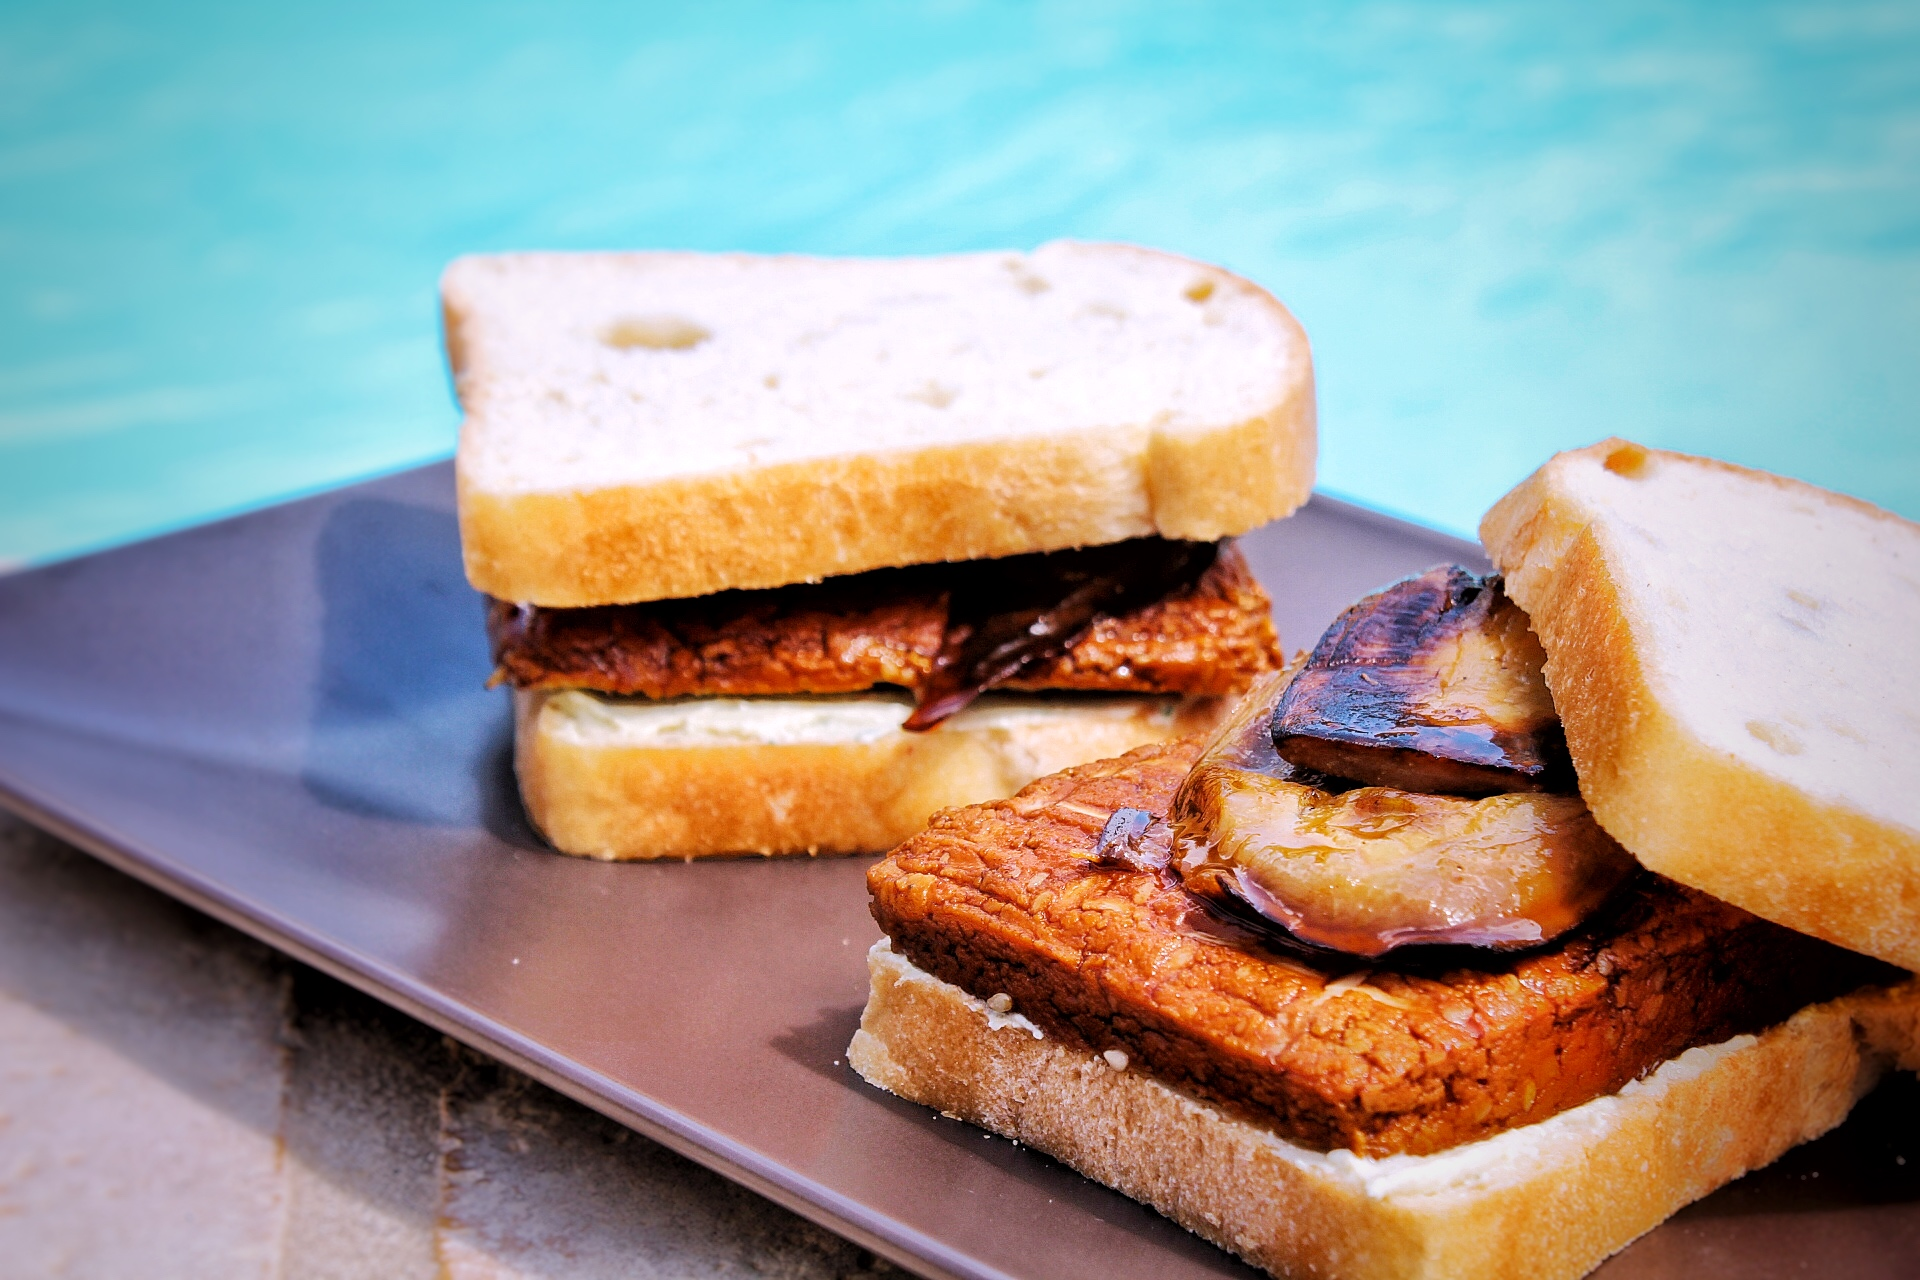 Sandwich tofu fumé aubergine sojami vegan sans gluten sans lactose bio